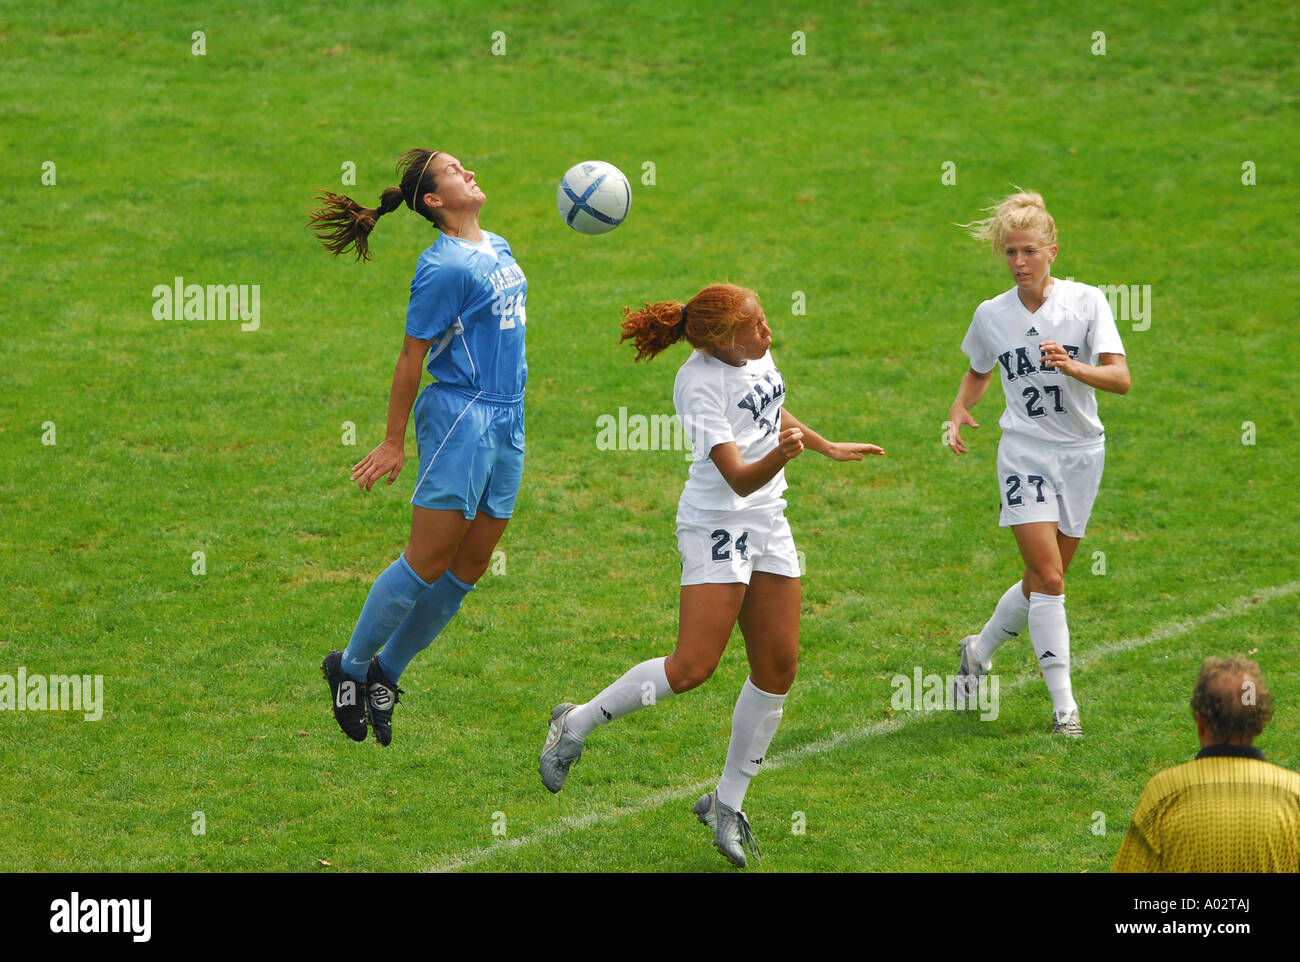 079675a1e4f Yale Vs North Carolina Women s soccer New Haven CT USA Stock Photo ...